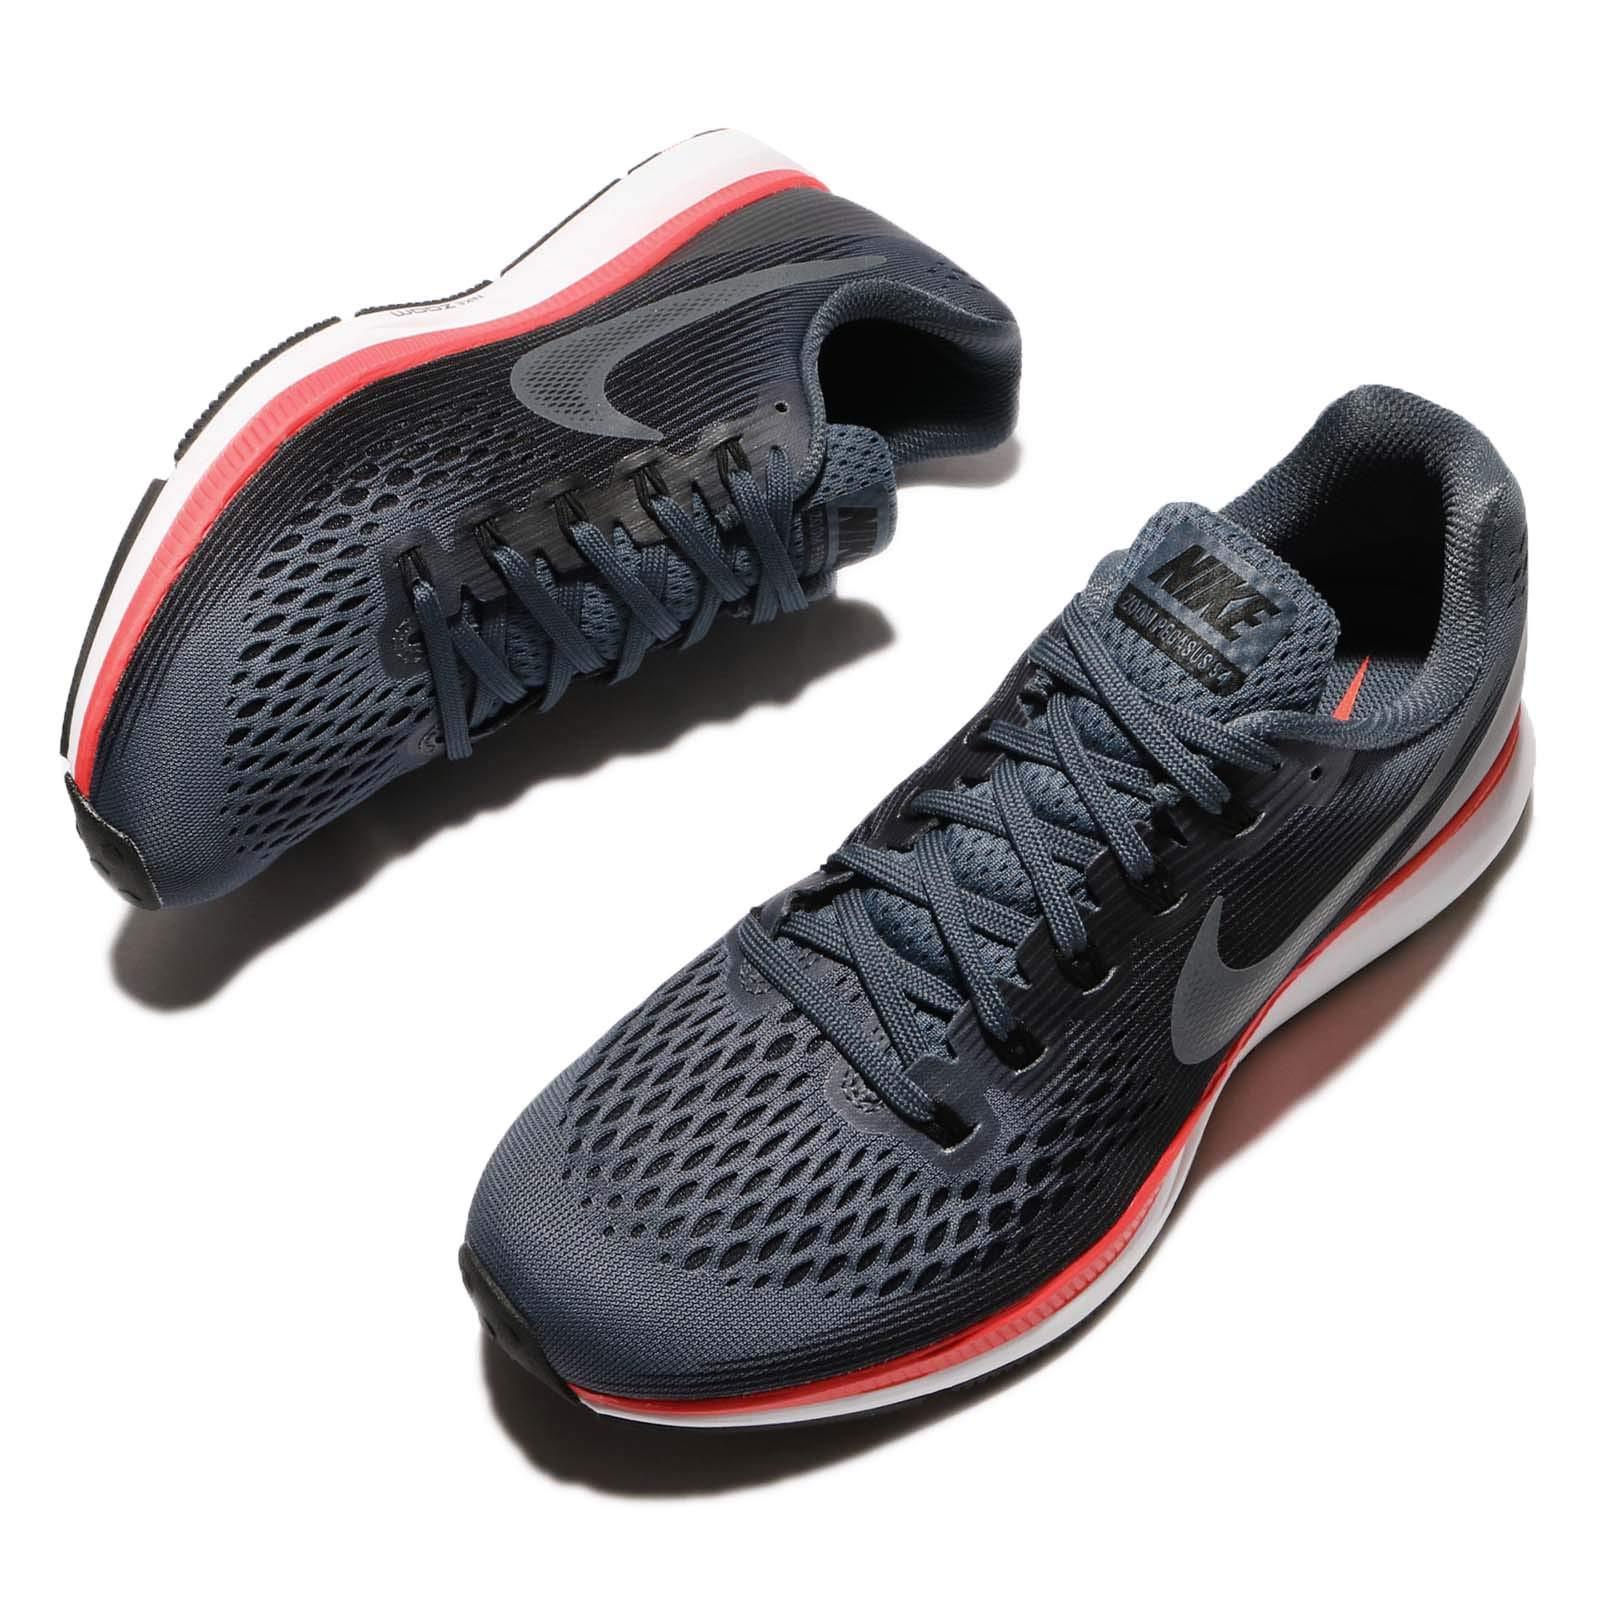 Nike Women's Air Zoom Pegasus 34 Running Shoes-Blue Fox/Black-5 by Nike (Image #6)